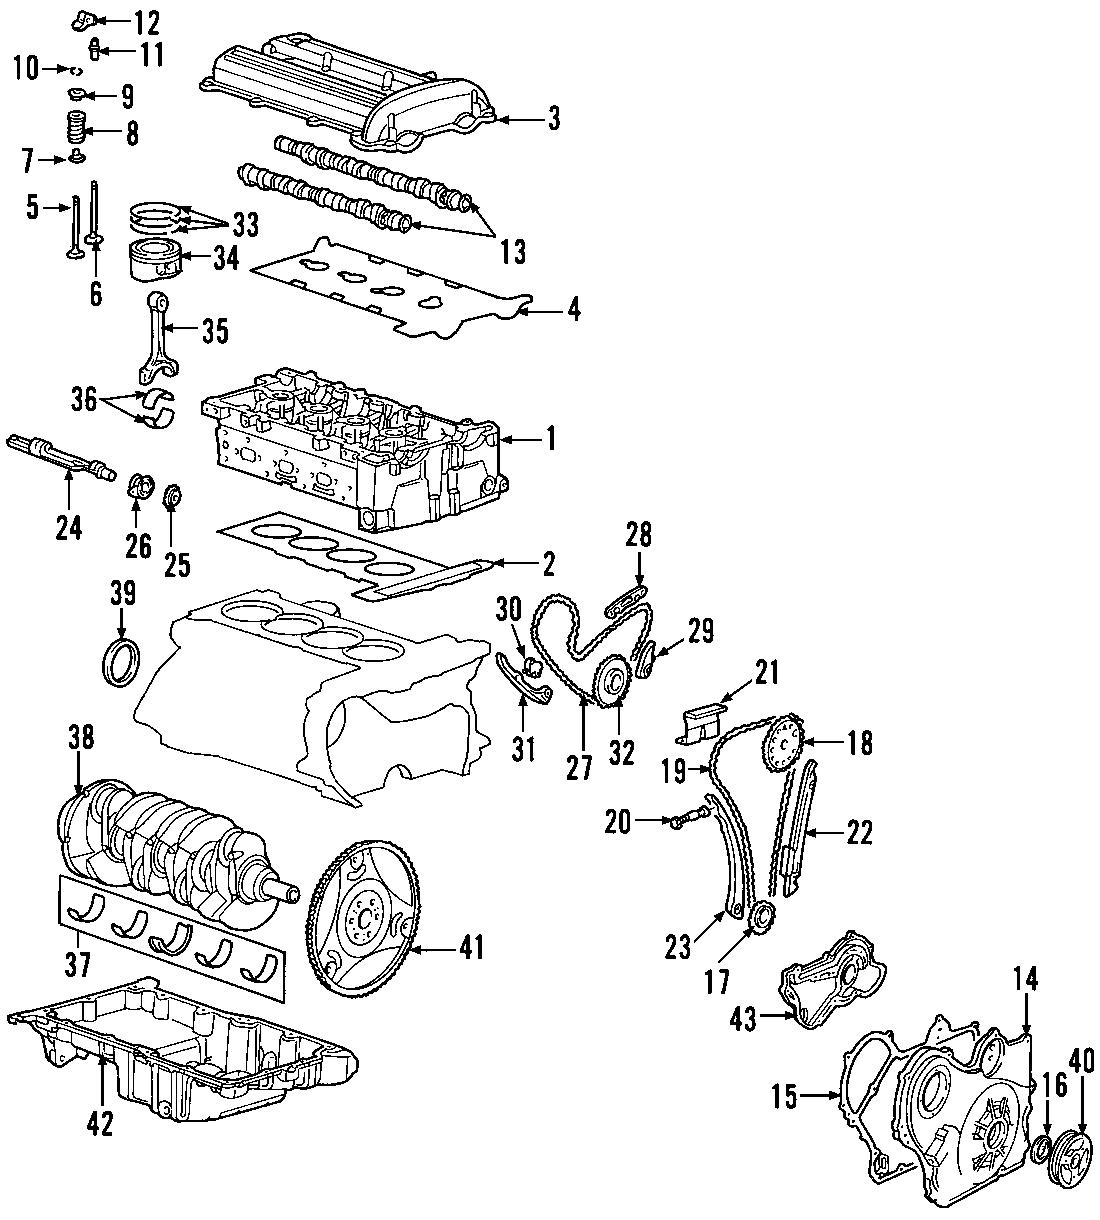 Chevrolet Cavalier Engine Cylinder Head Gasket Set  G5  2